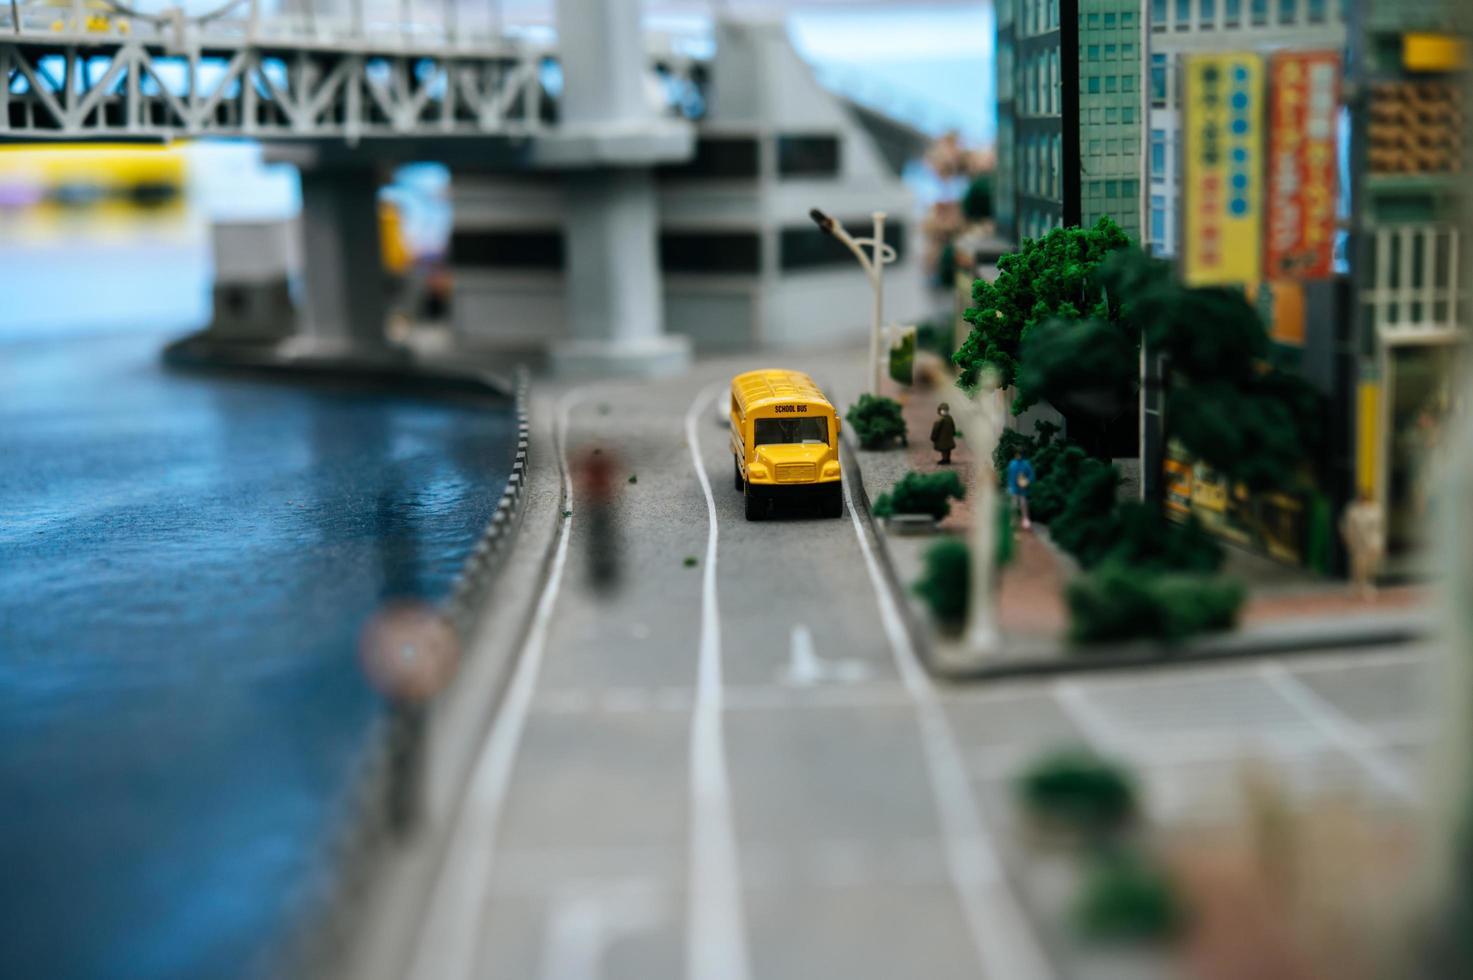 Close-up of miniature toy city landscape photo